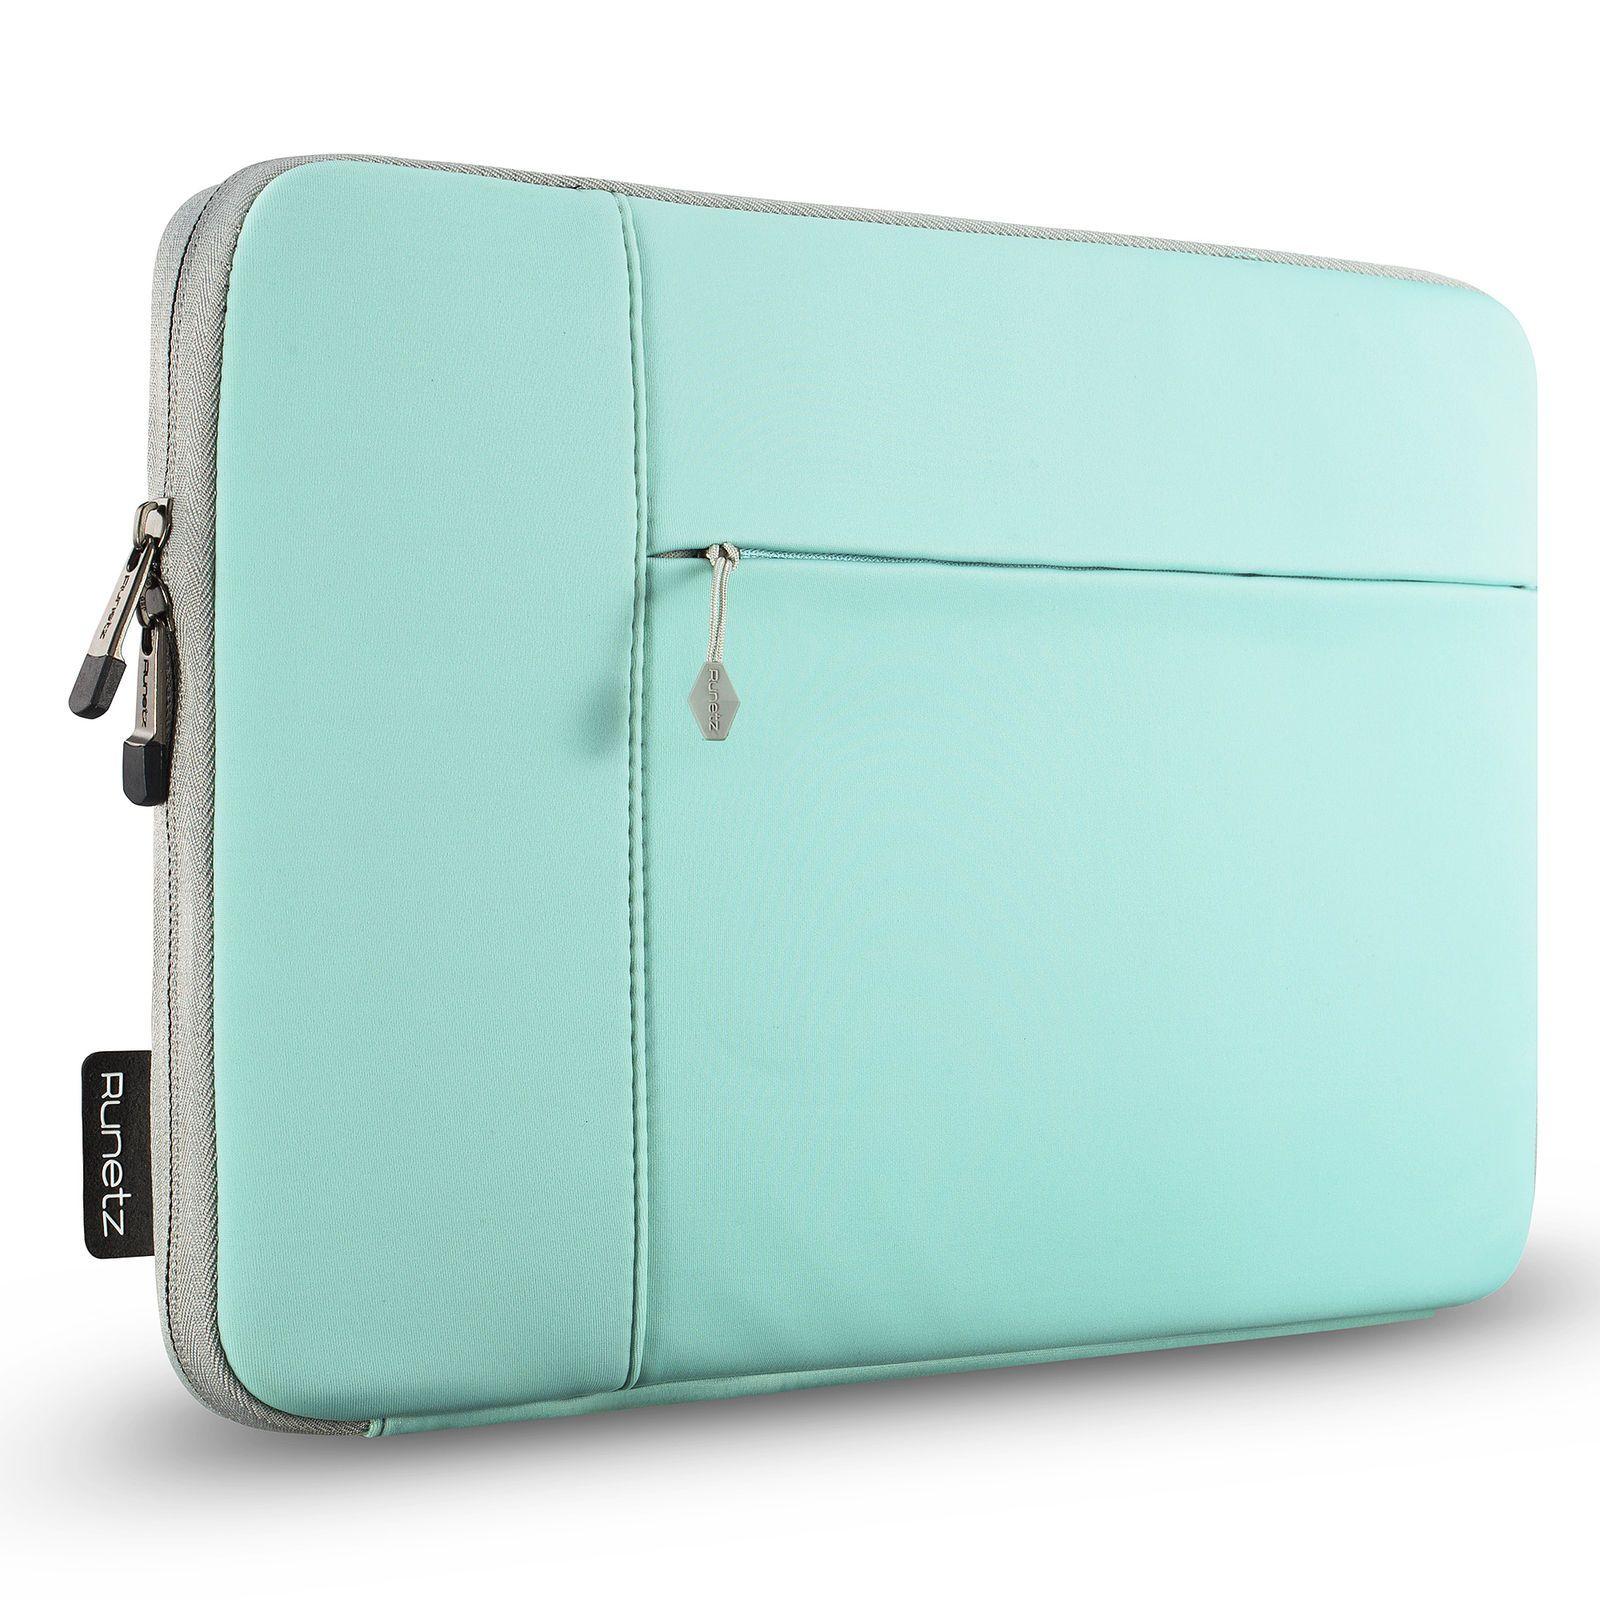 promo code 8fe83 12a37 Details about Runetz - Sleeve for MacBook 13 ASUS LENOVA Laptop ...